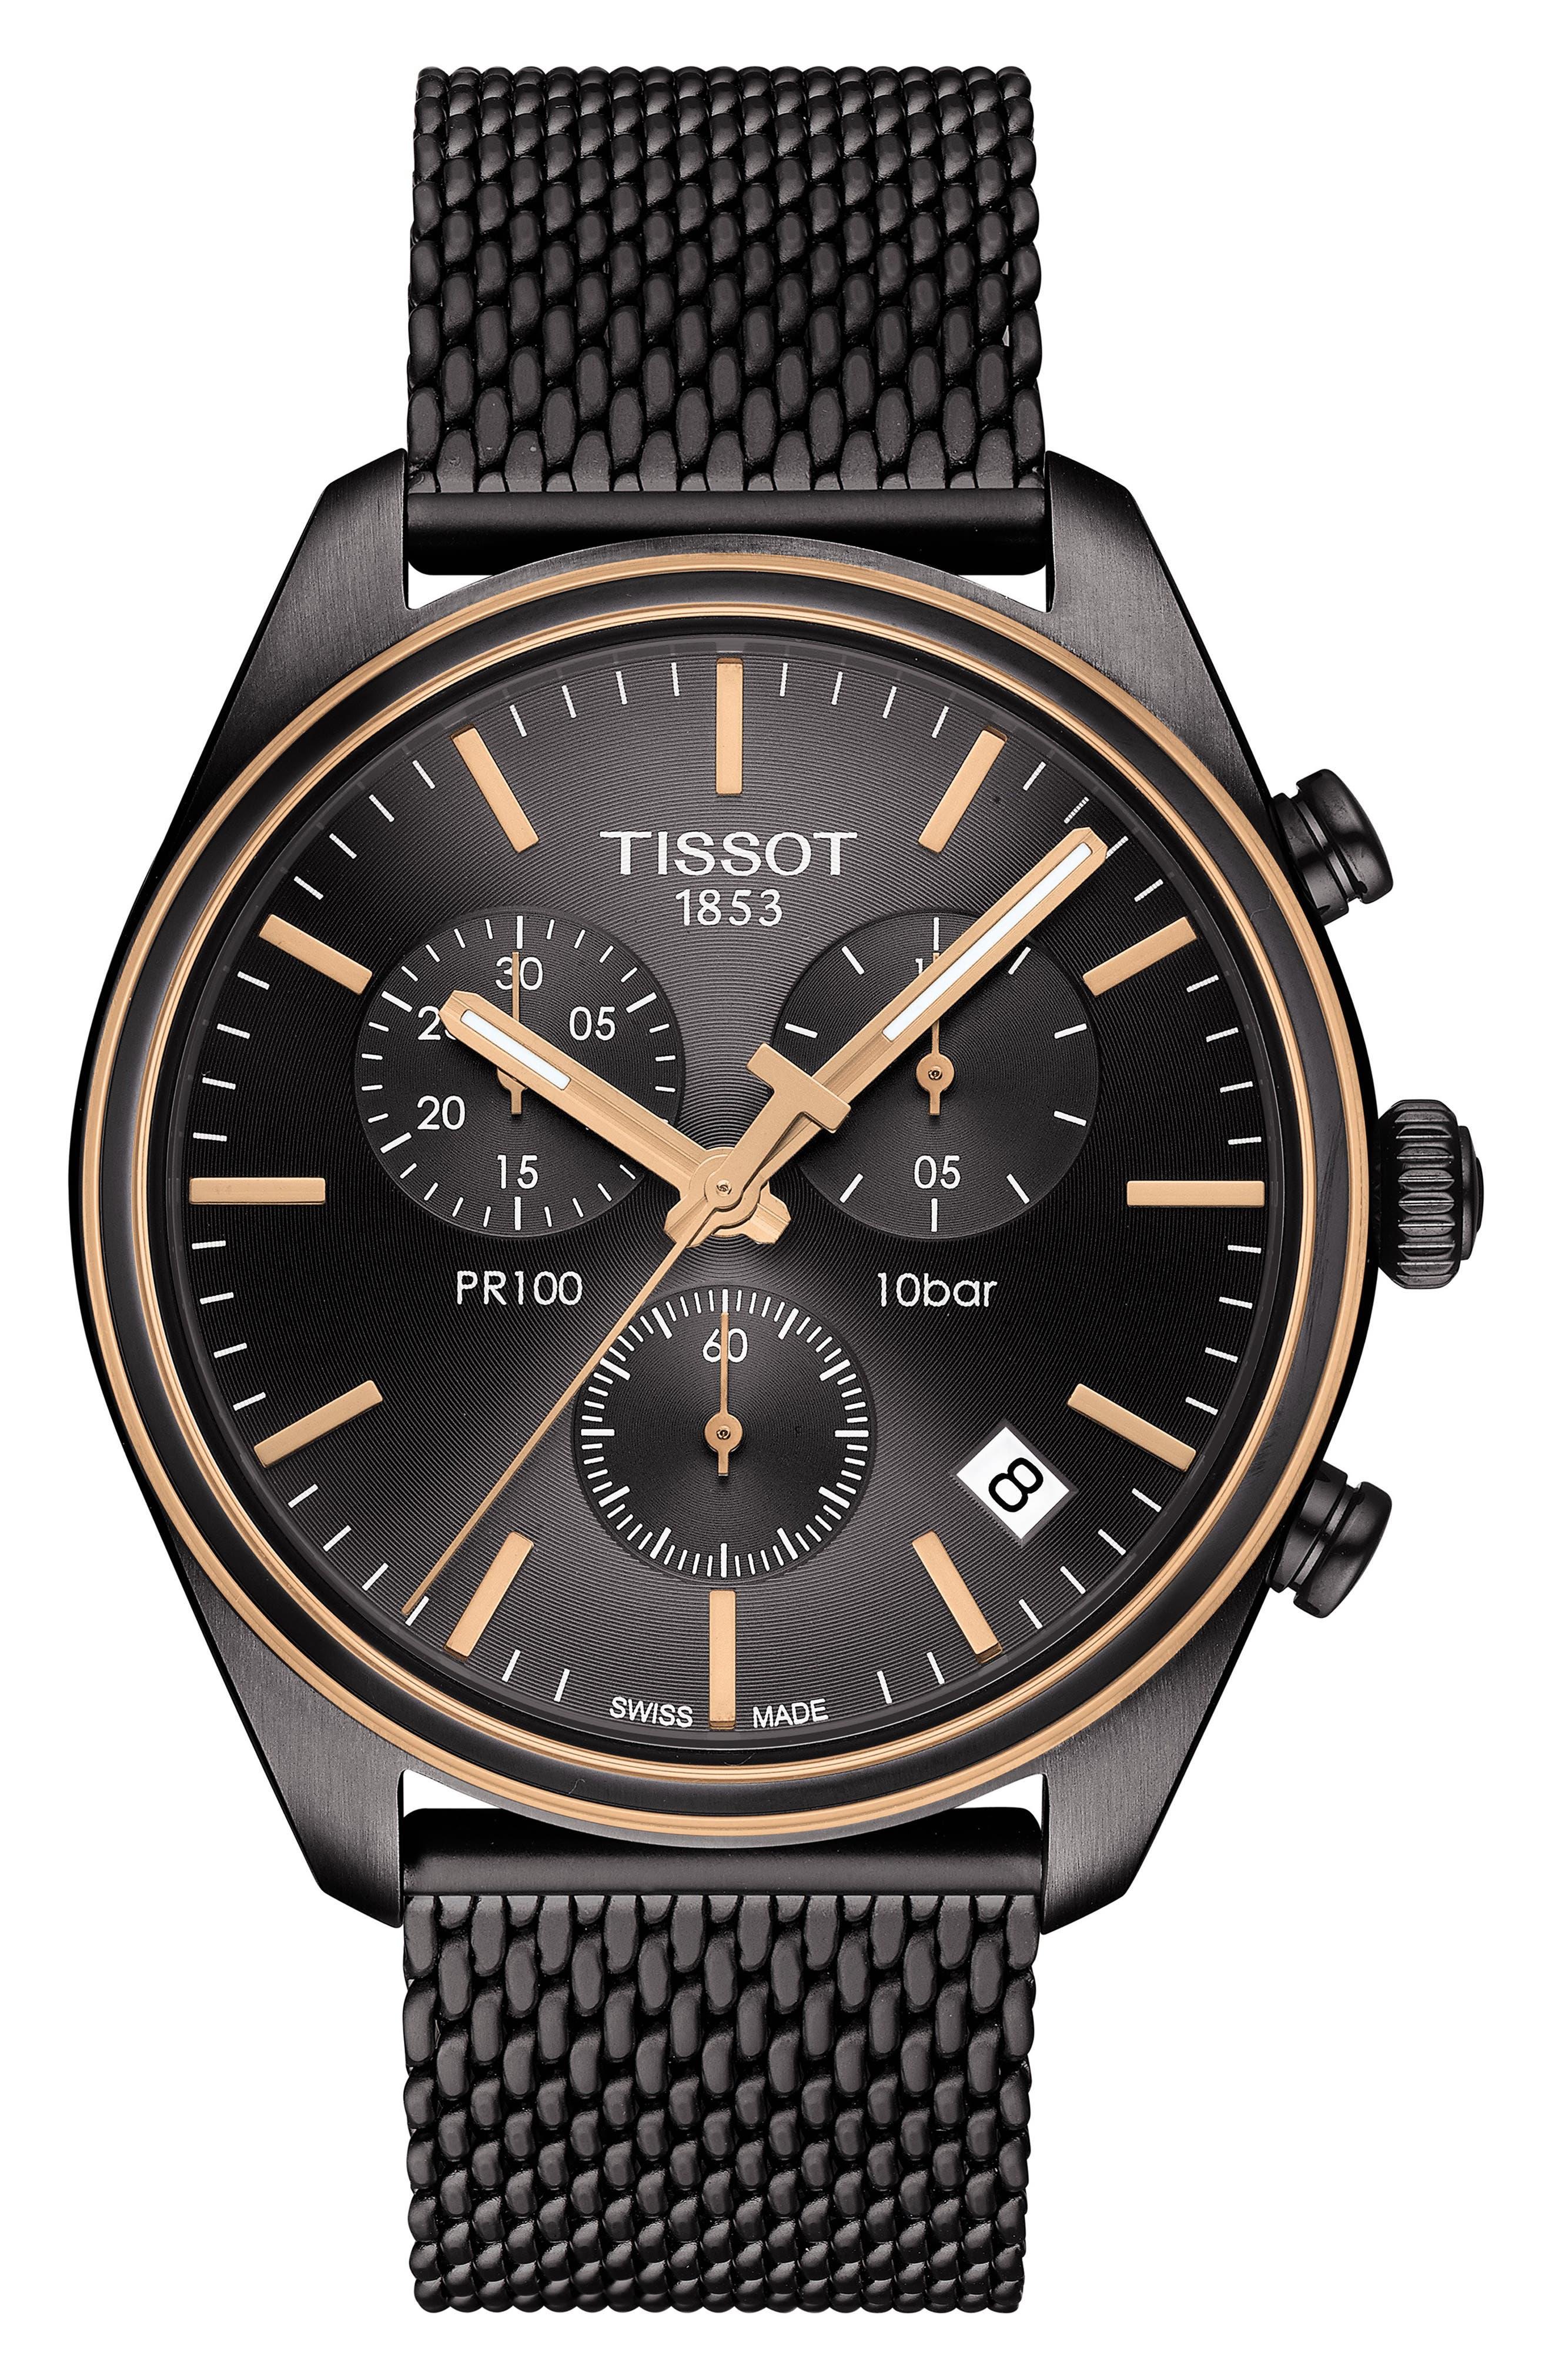 TISSOT T-Classic PR 100 Chronograph Mesh Bracelet Watch, 41mm, Main, color, SILVER/ ANTHRACITE/ ROSE GOLD